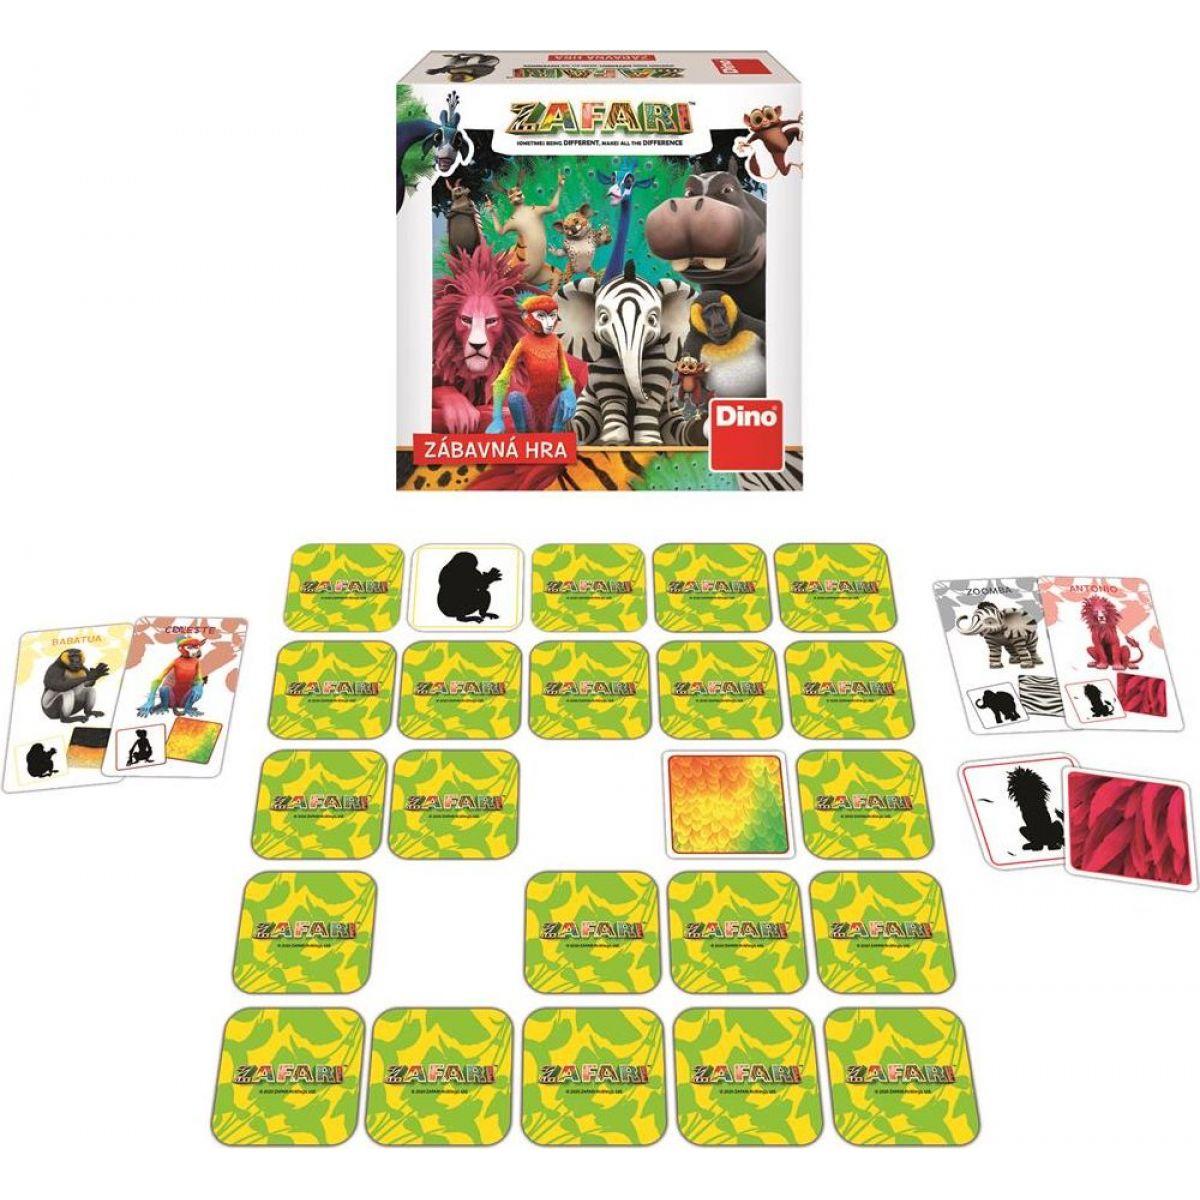 Dino Zafar detská hra